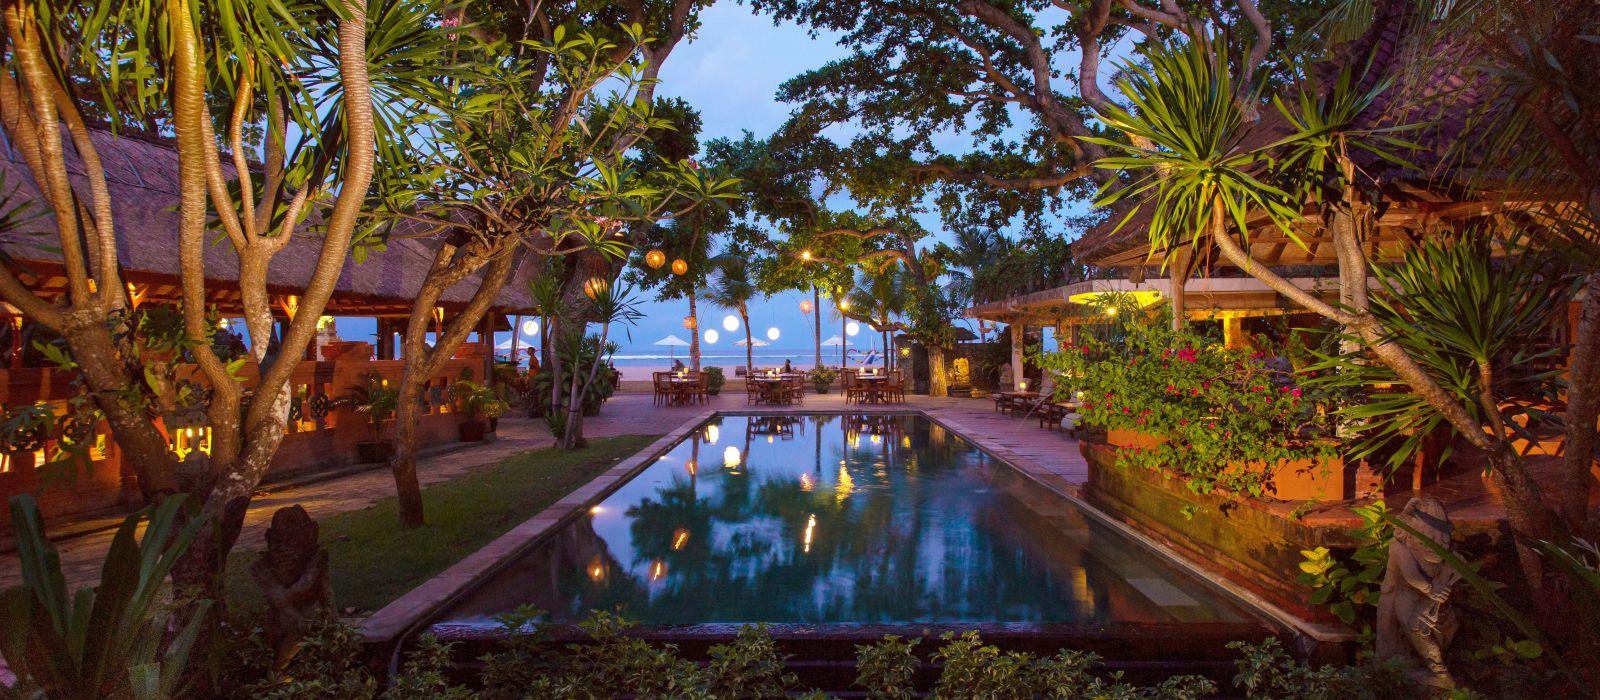 Hotel The Tandjung Sari %region%